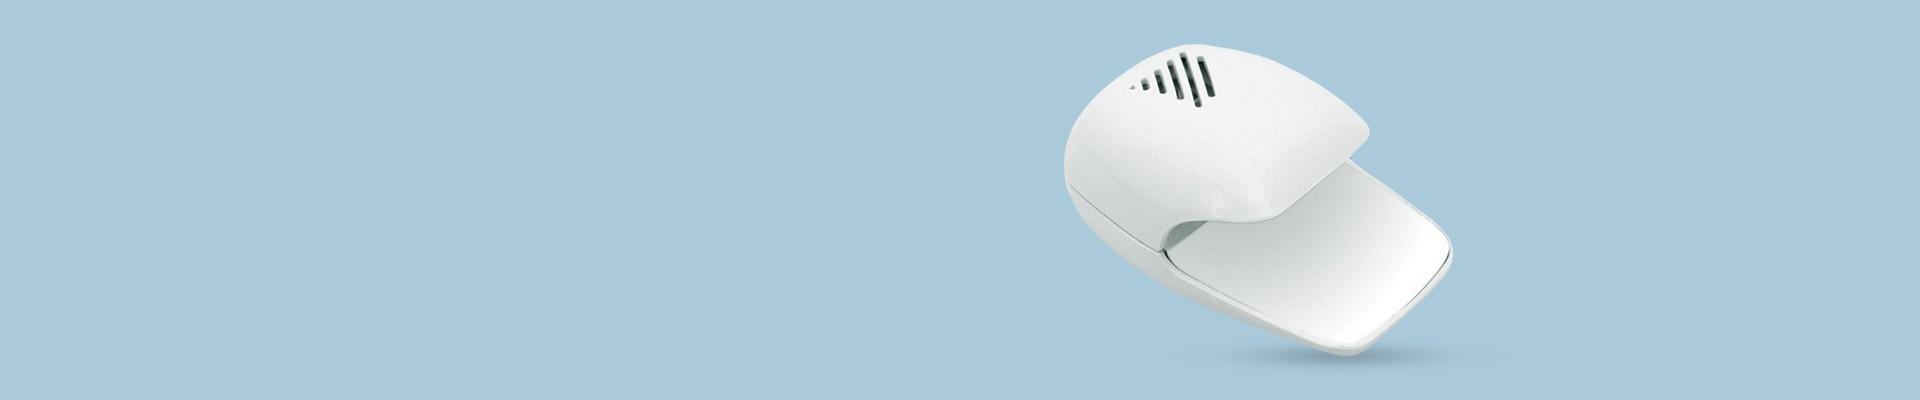 Jual Portable Nail Dryer - Pengering Kuku Terbaik